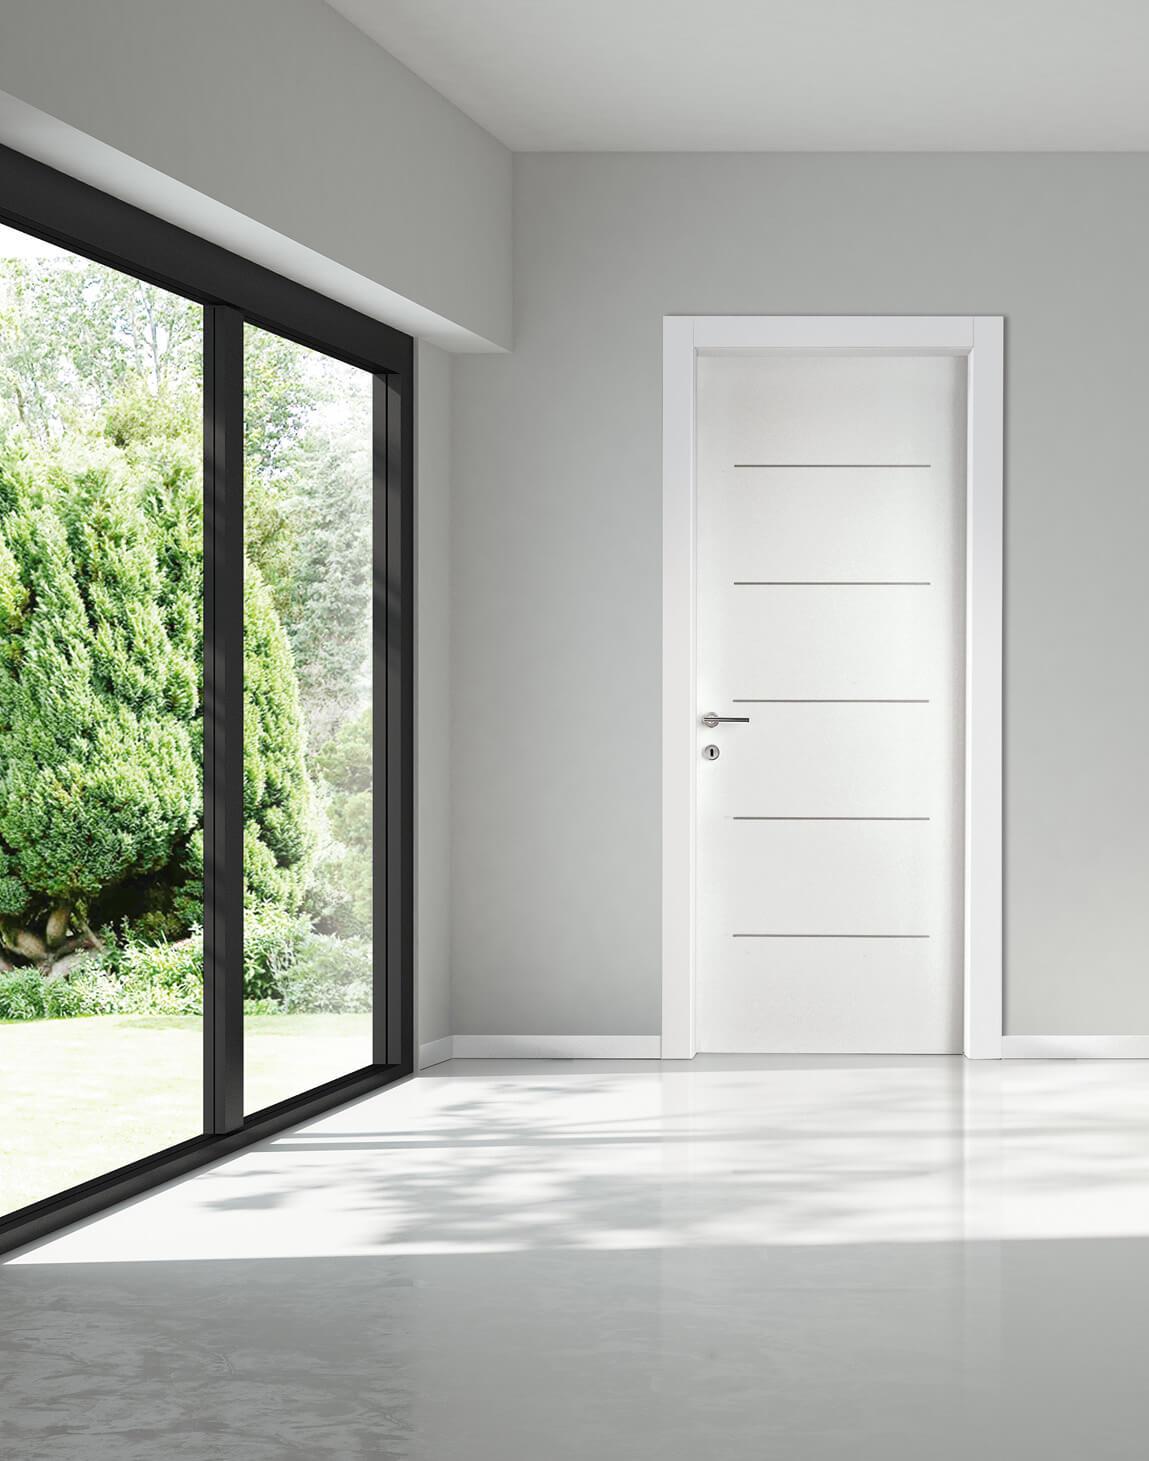 Porte interne porte scorrevoli porte a filo muro e porte in vetro molaro - Porte gd dorigo ...